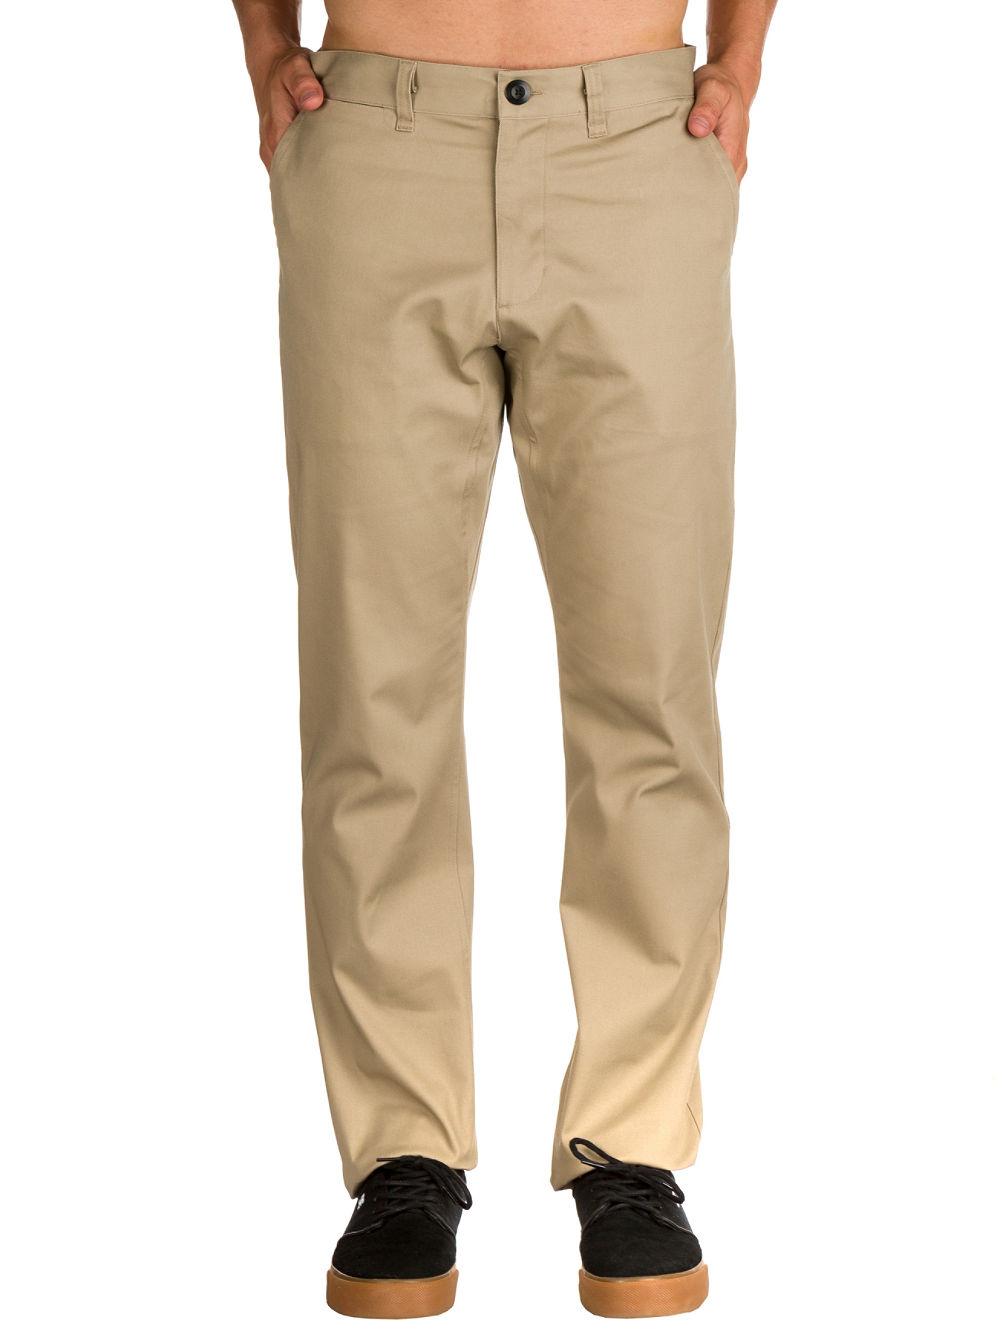 35e84b532045 Buy Nike SB FLX Chino Icon Pants online at Blue Tomato